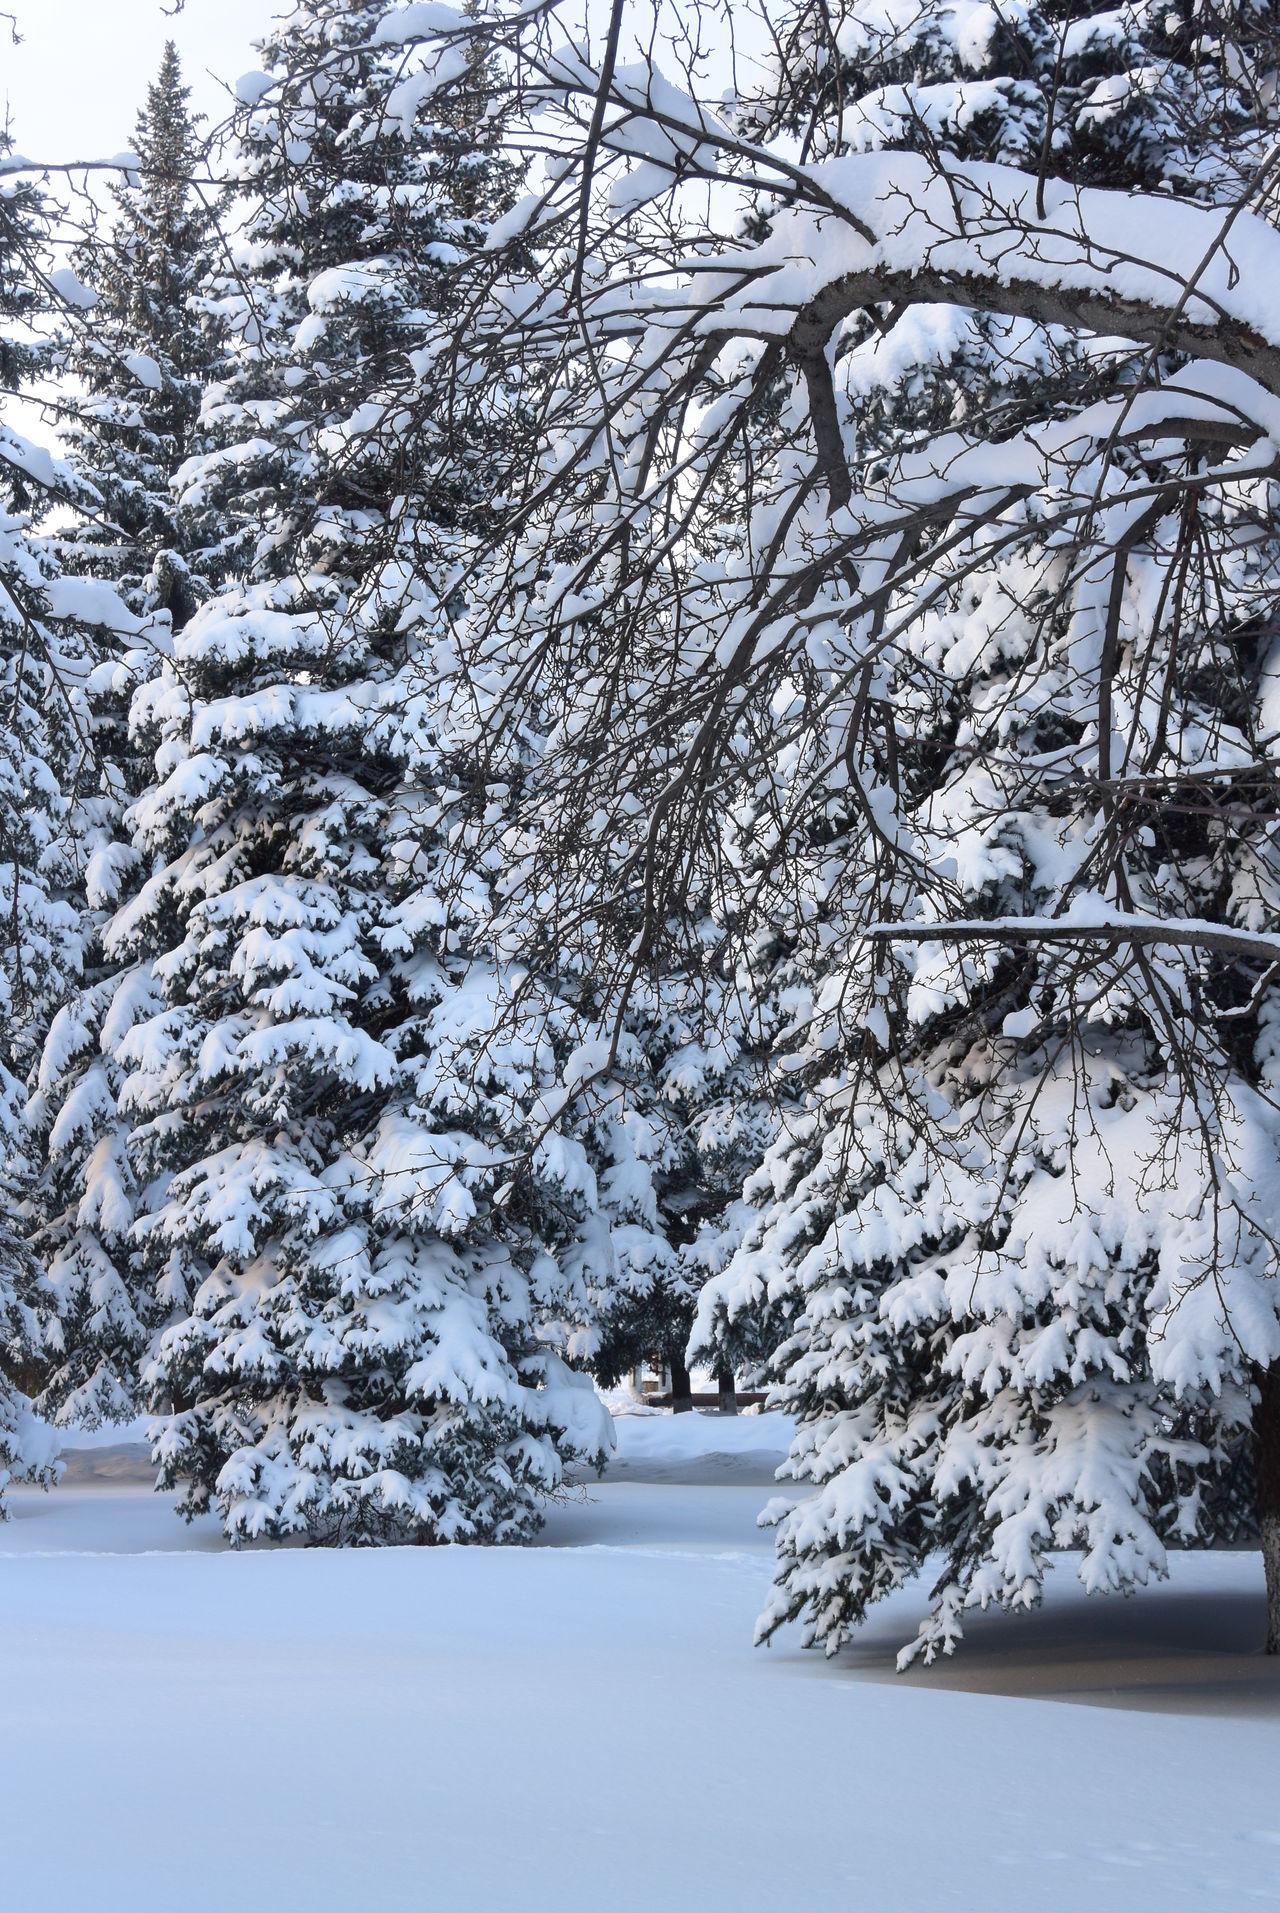 зима 2016 Fairytale  Зимняя сказка❄️⛄️❄️ Hello World Sound Of Life Nature